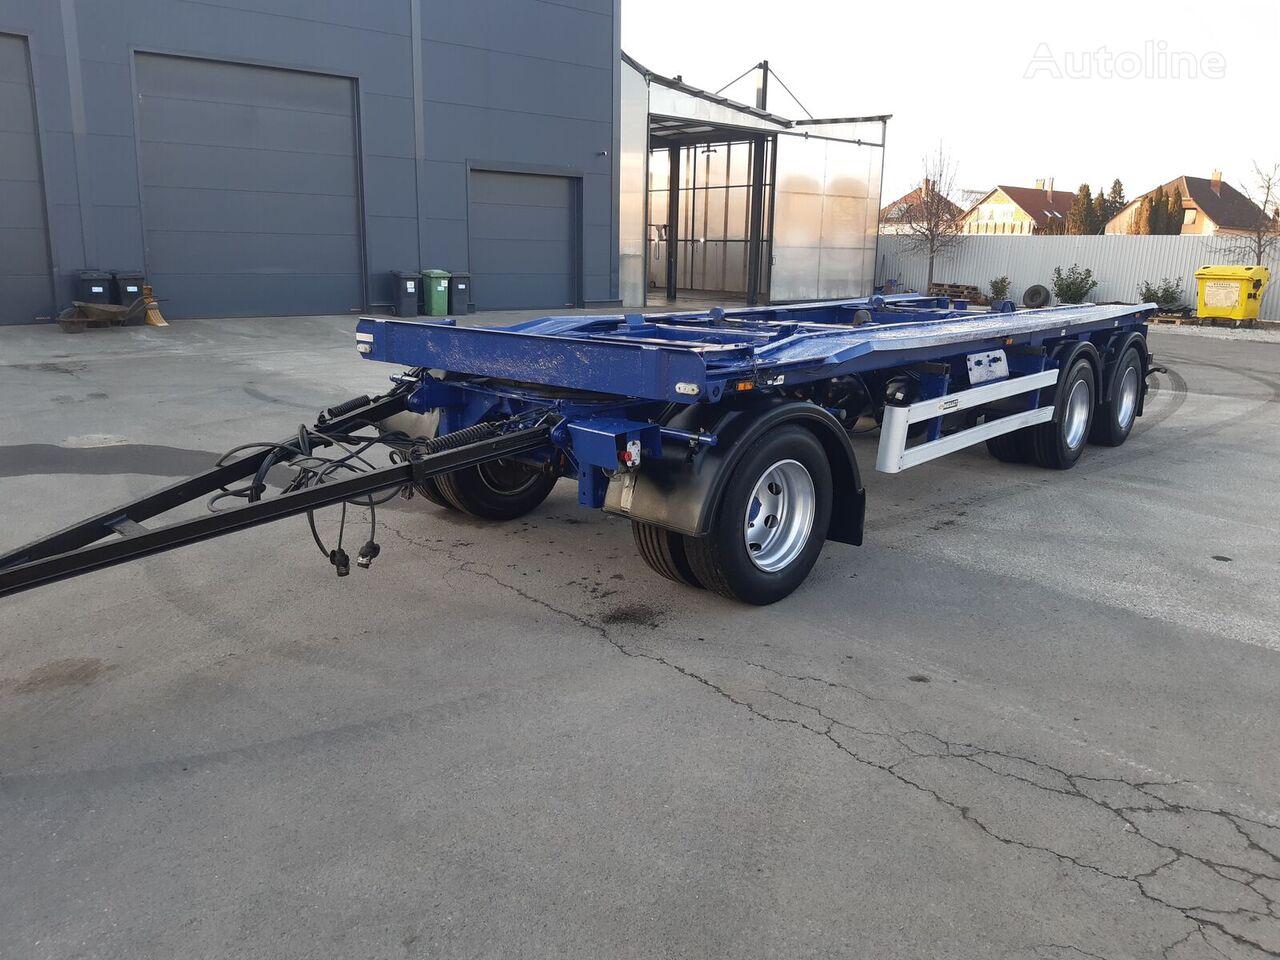 MEILLER G24 DUPLA KONTÉNERSZÁLLÍTÓ 3 TENG. 19 TO HASZNOS KAMPÓS LÁNCOS container chassis trailer